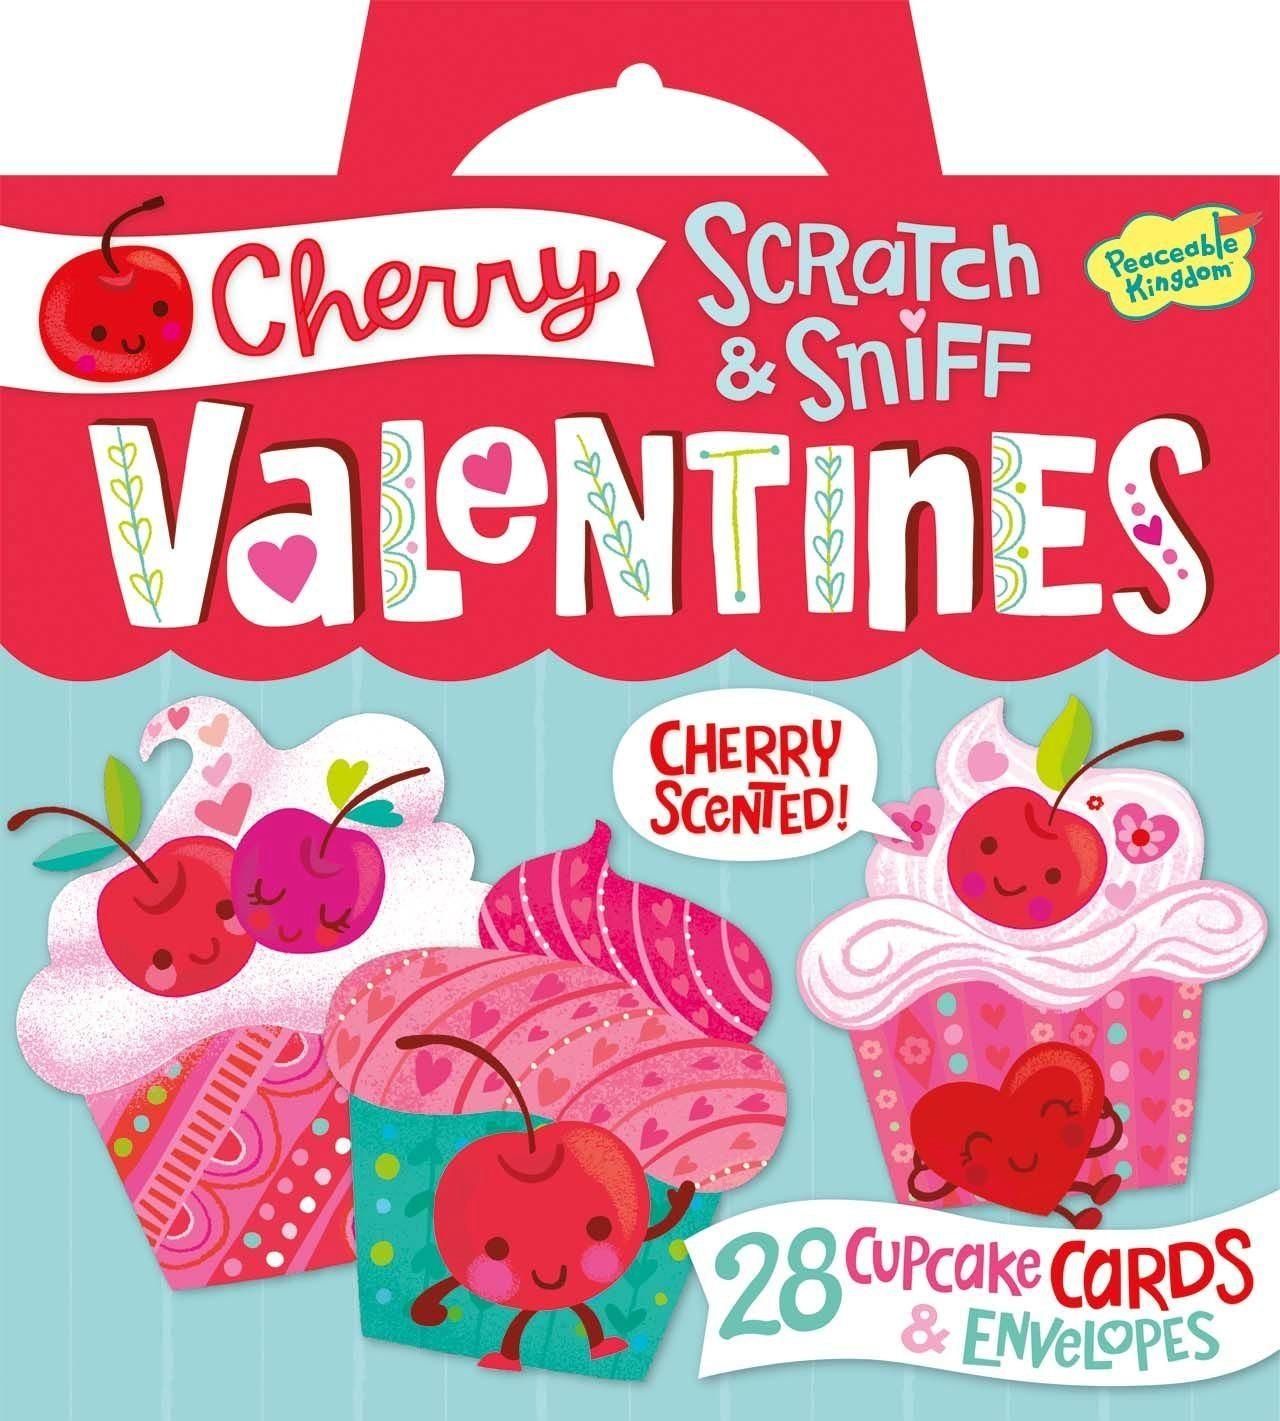 71QKM koUGL. SL1421  - Peaceable Kingdom Cherry Cupcake Scratch and Sniff Super Valentines Card Pack